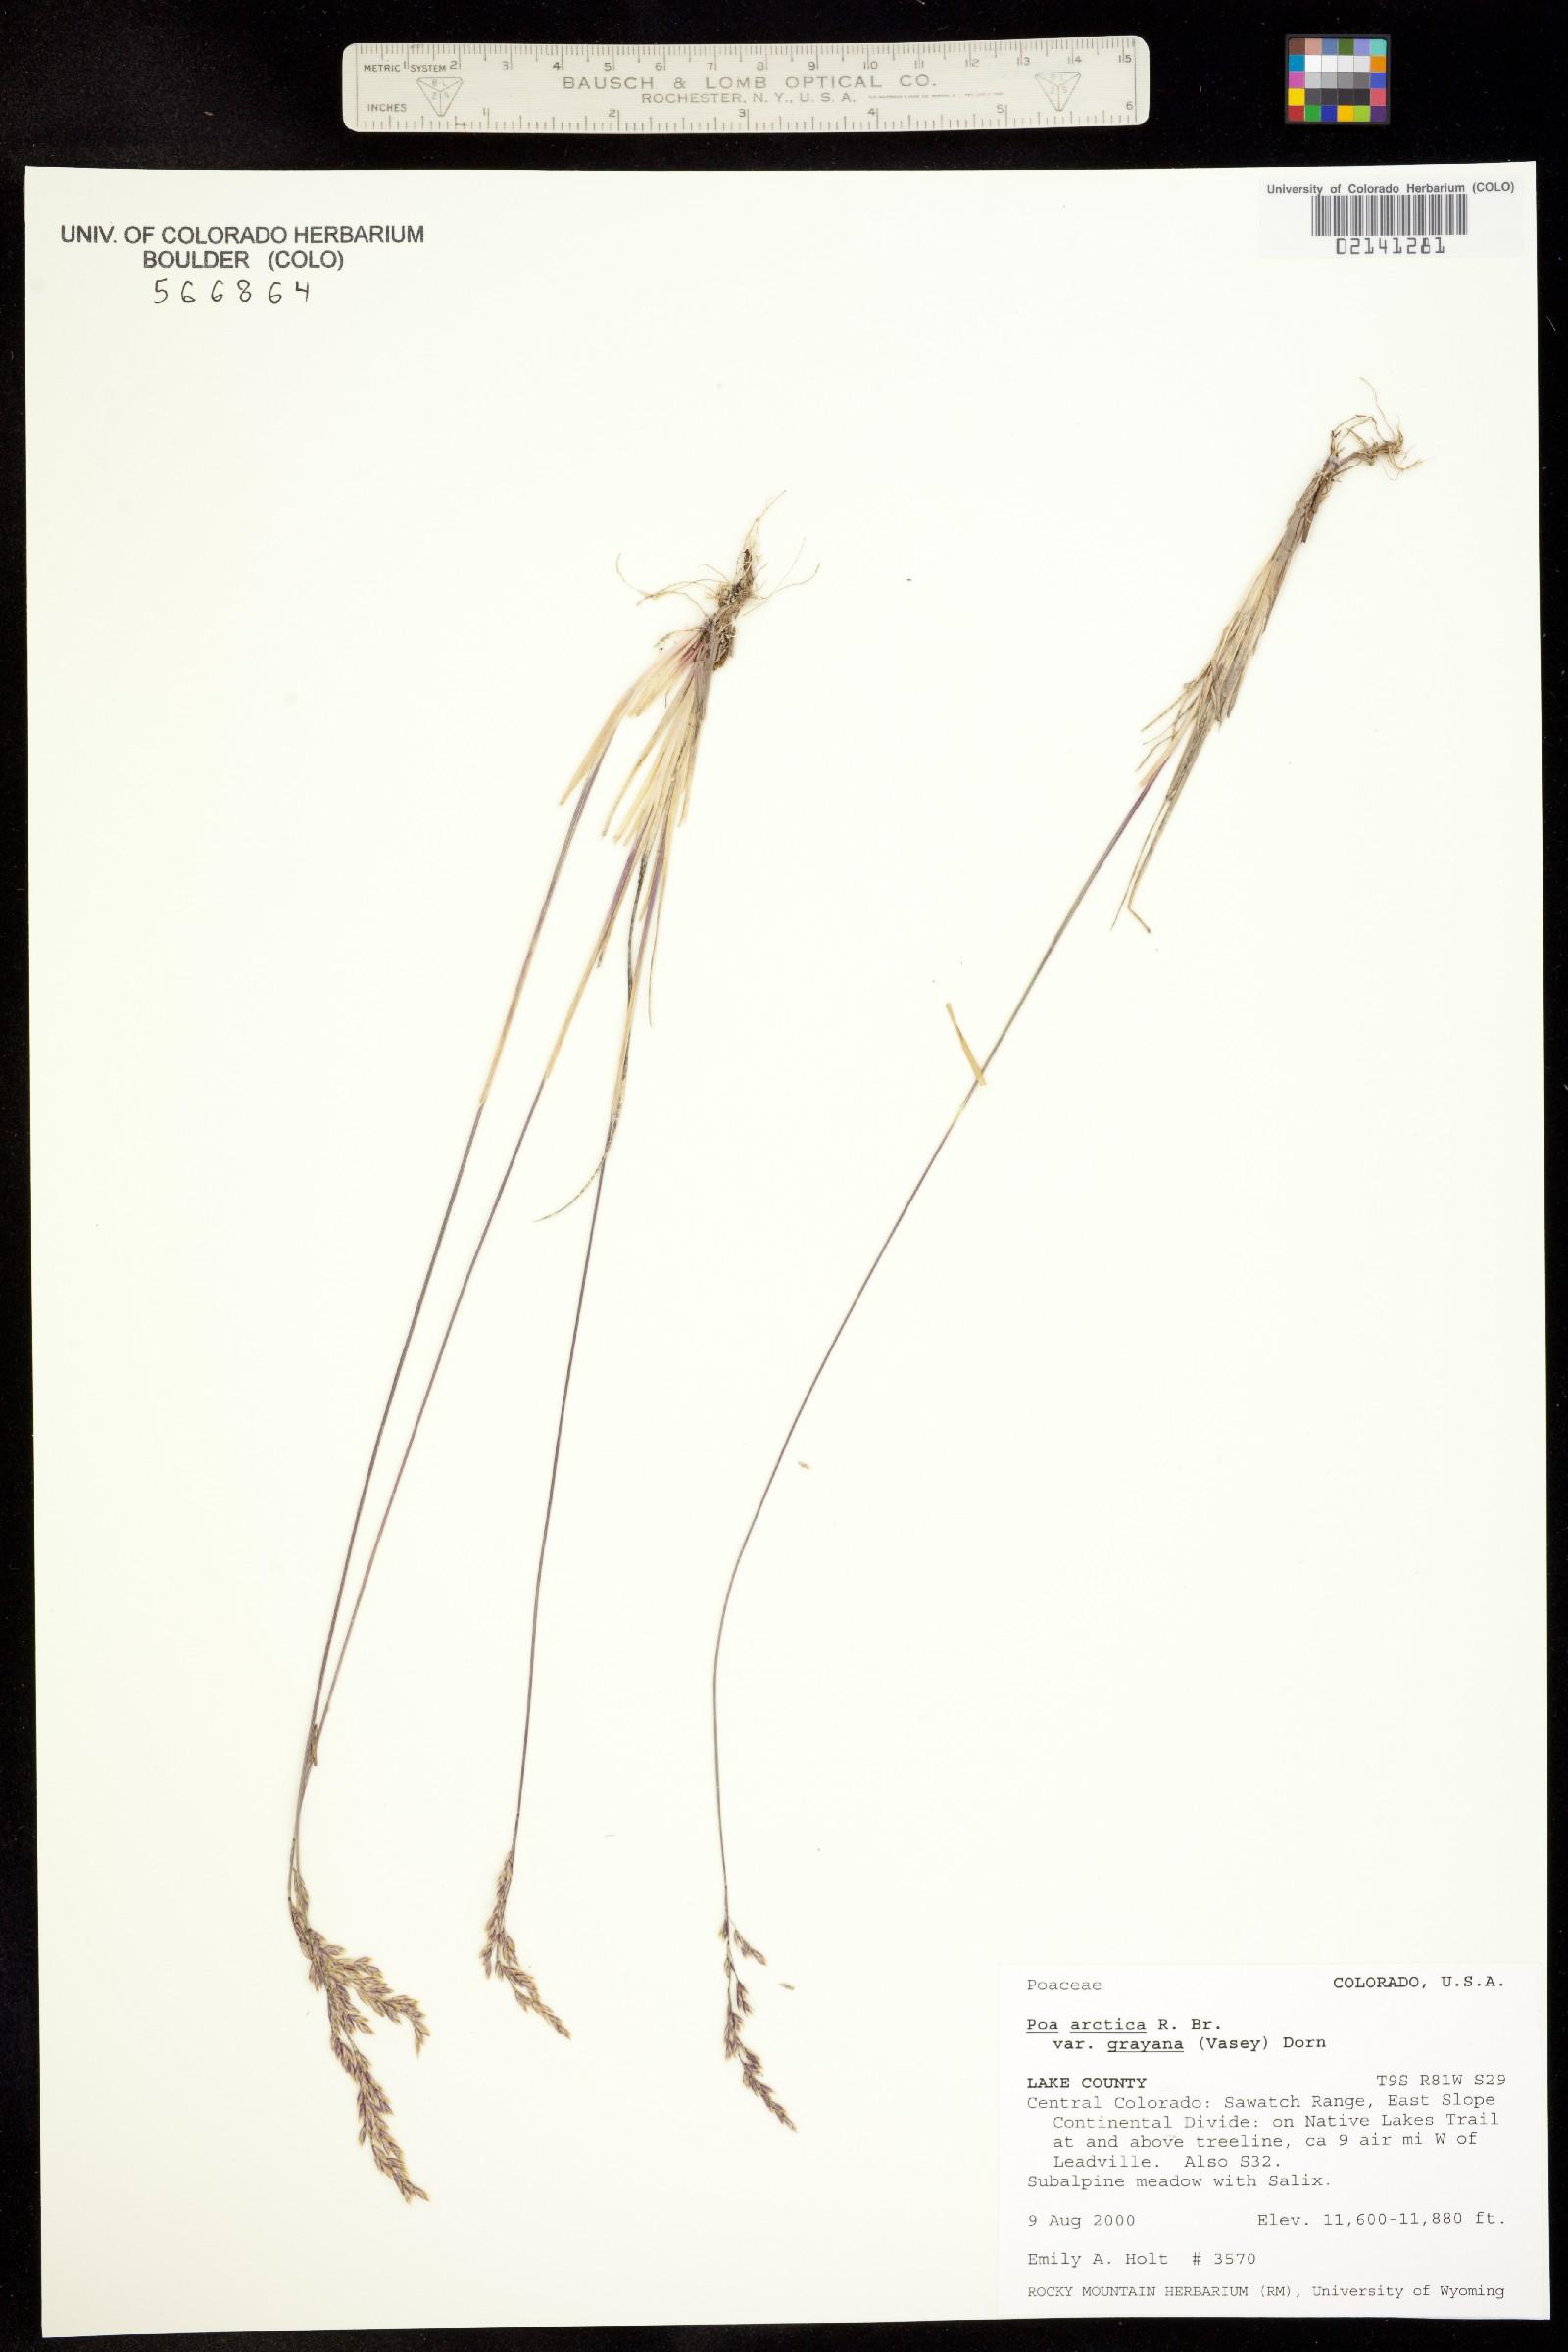 Poa arctica ssp. grayana image